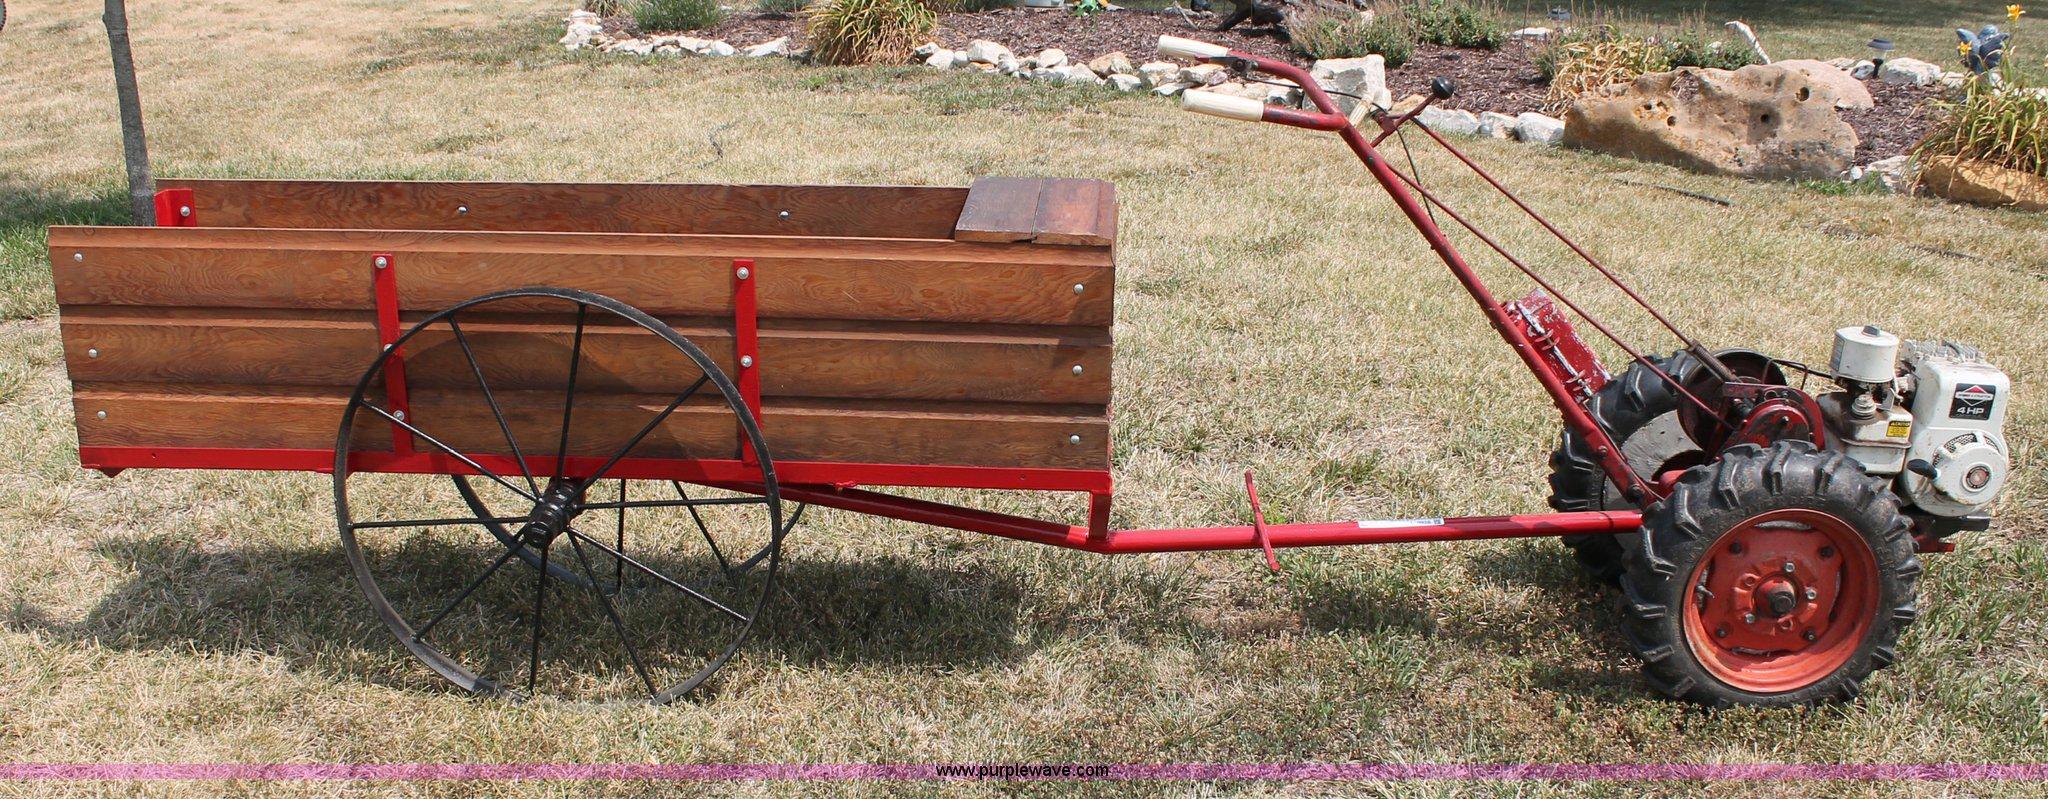 Montgomery Ward 65X-5993 Hoe-Trac garden tractor   Item L992...